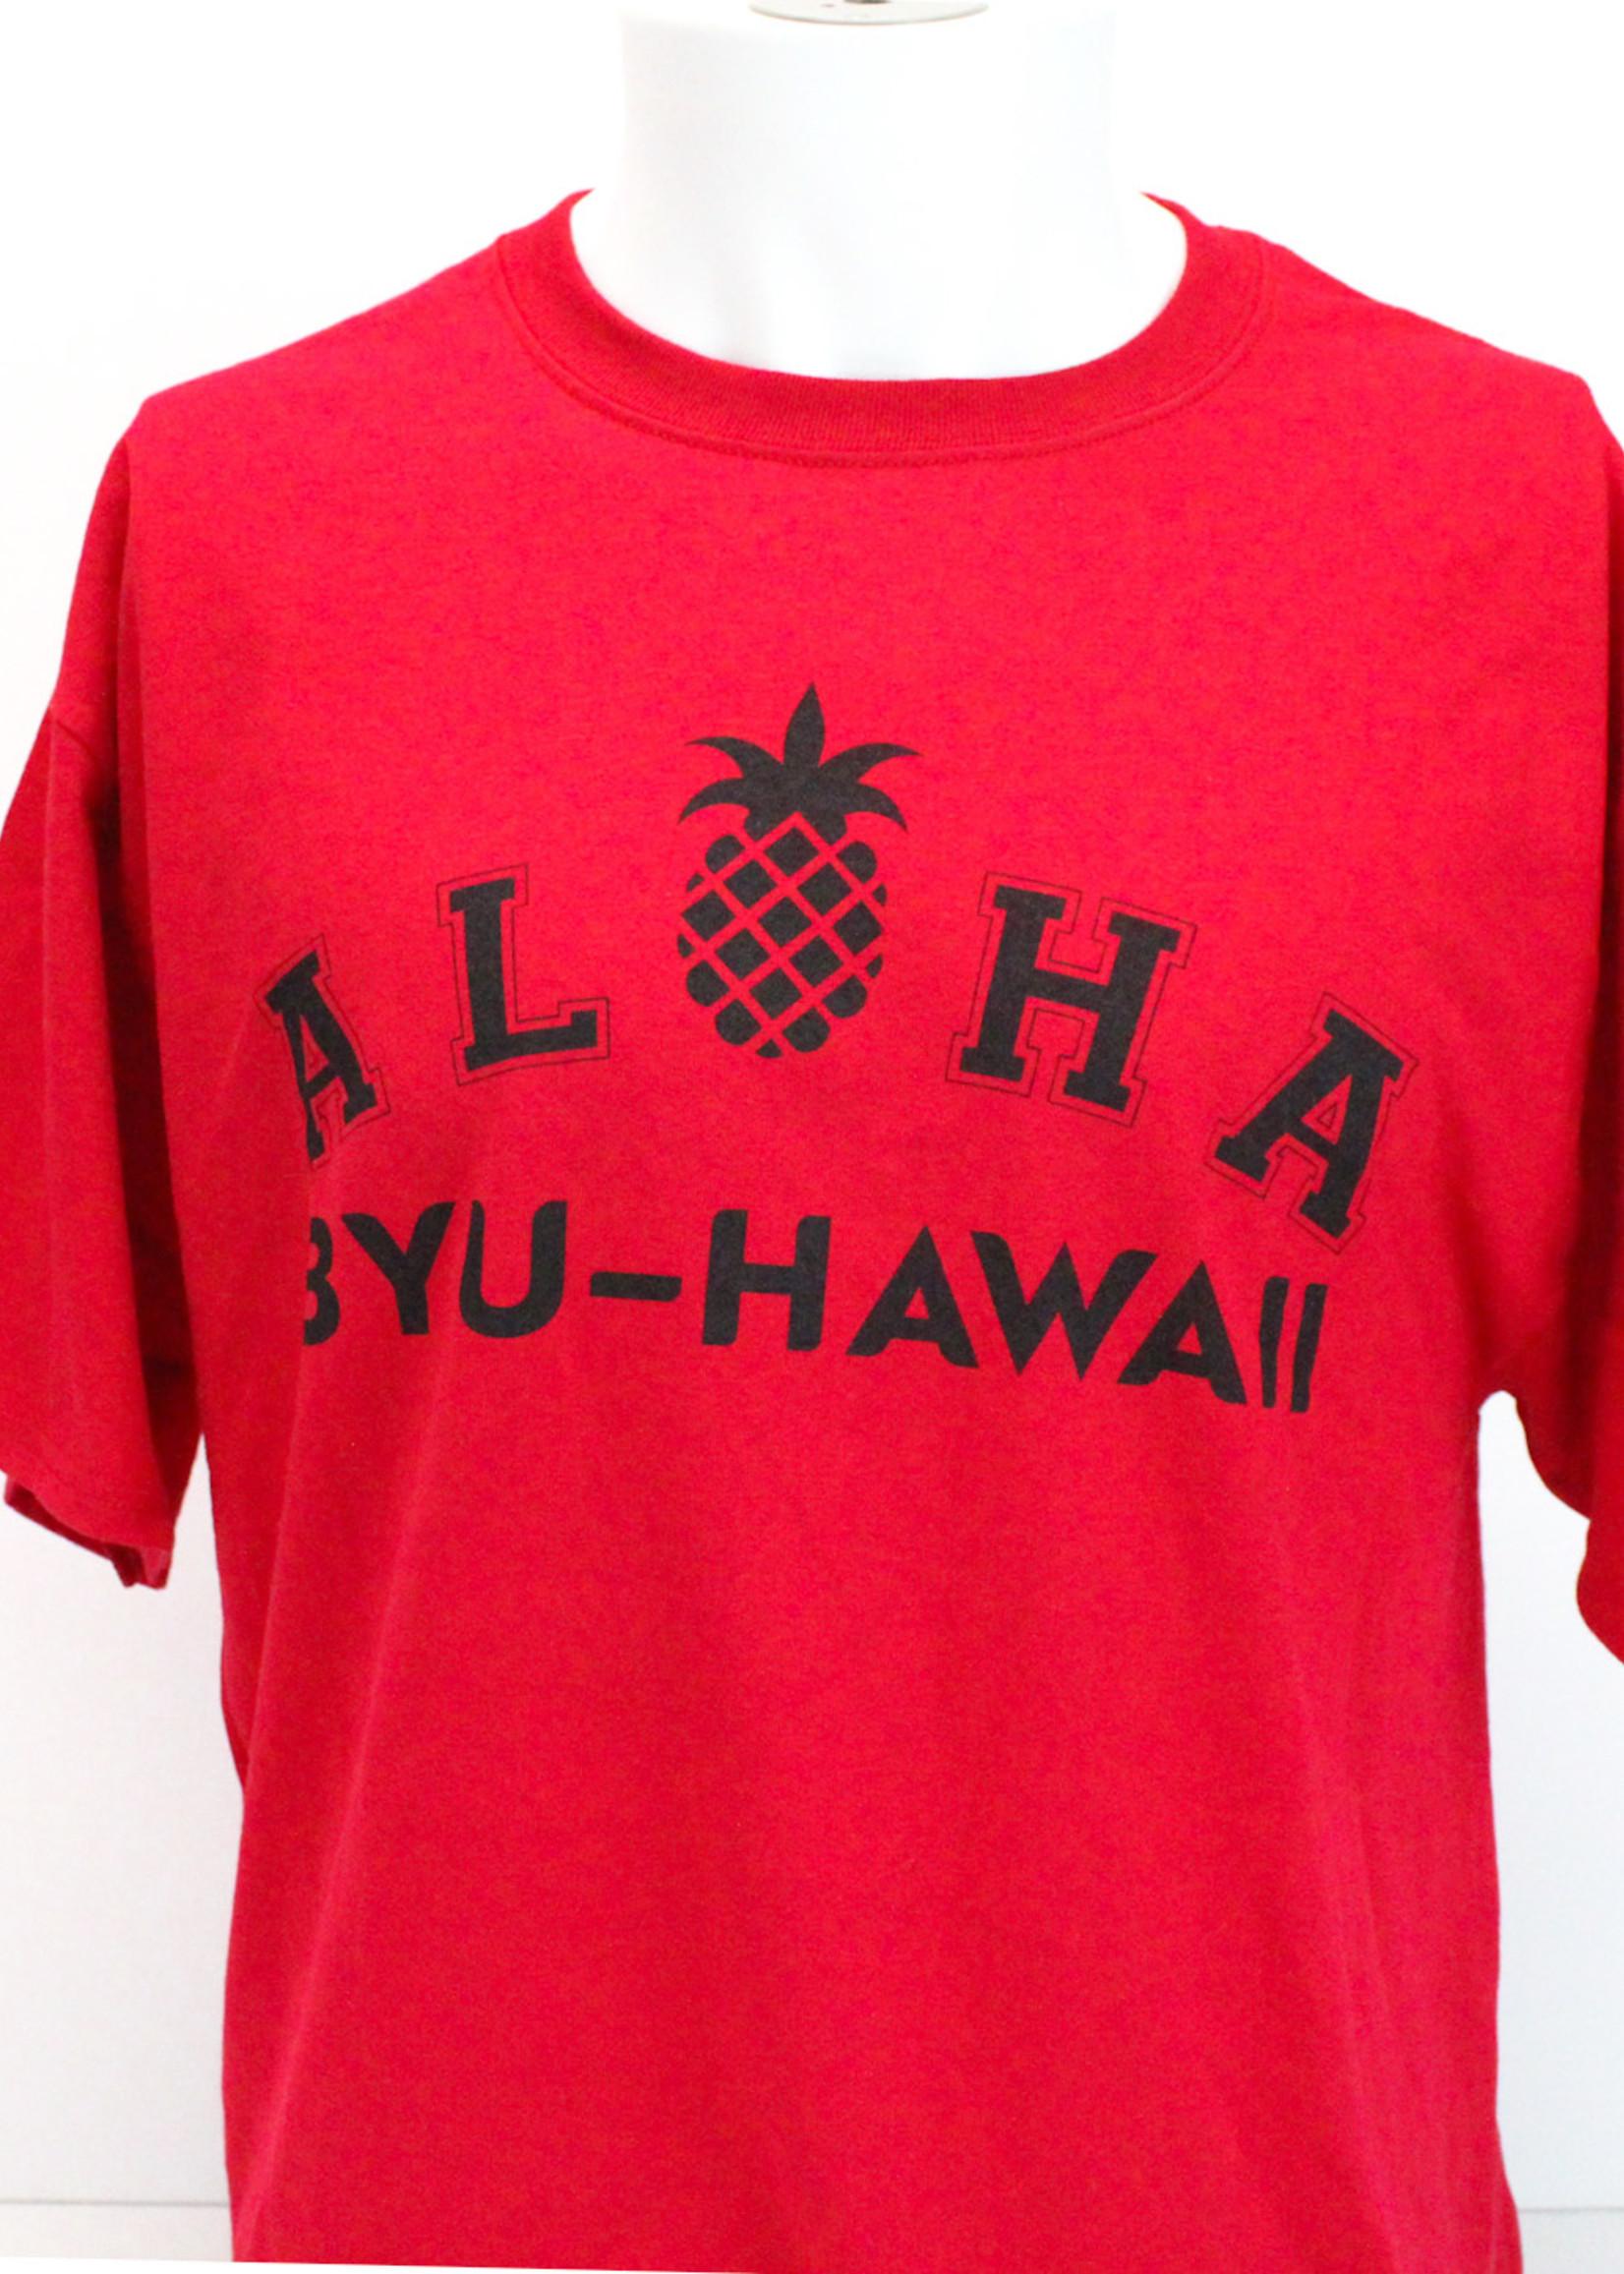 Clearance - BYU-Hawaii Aloha Pineapple Tee